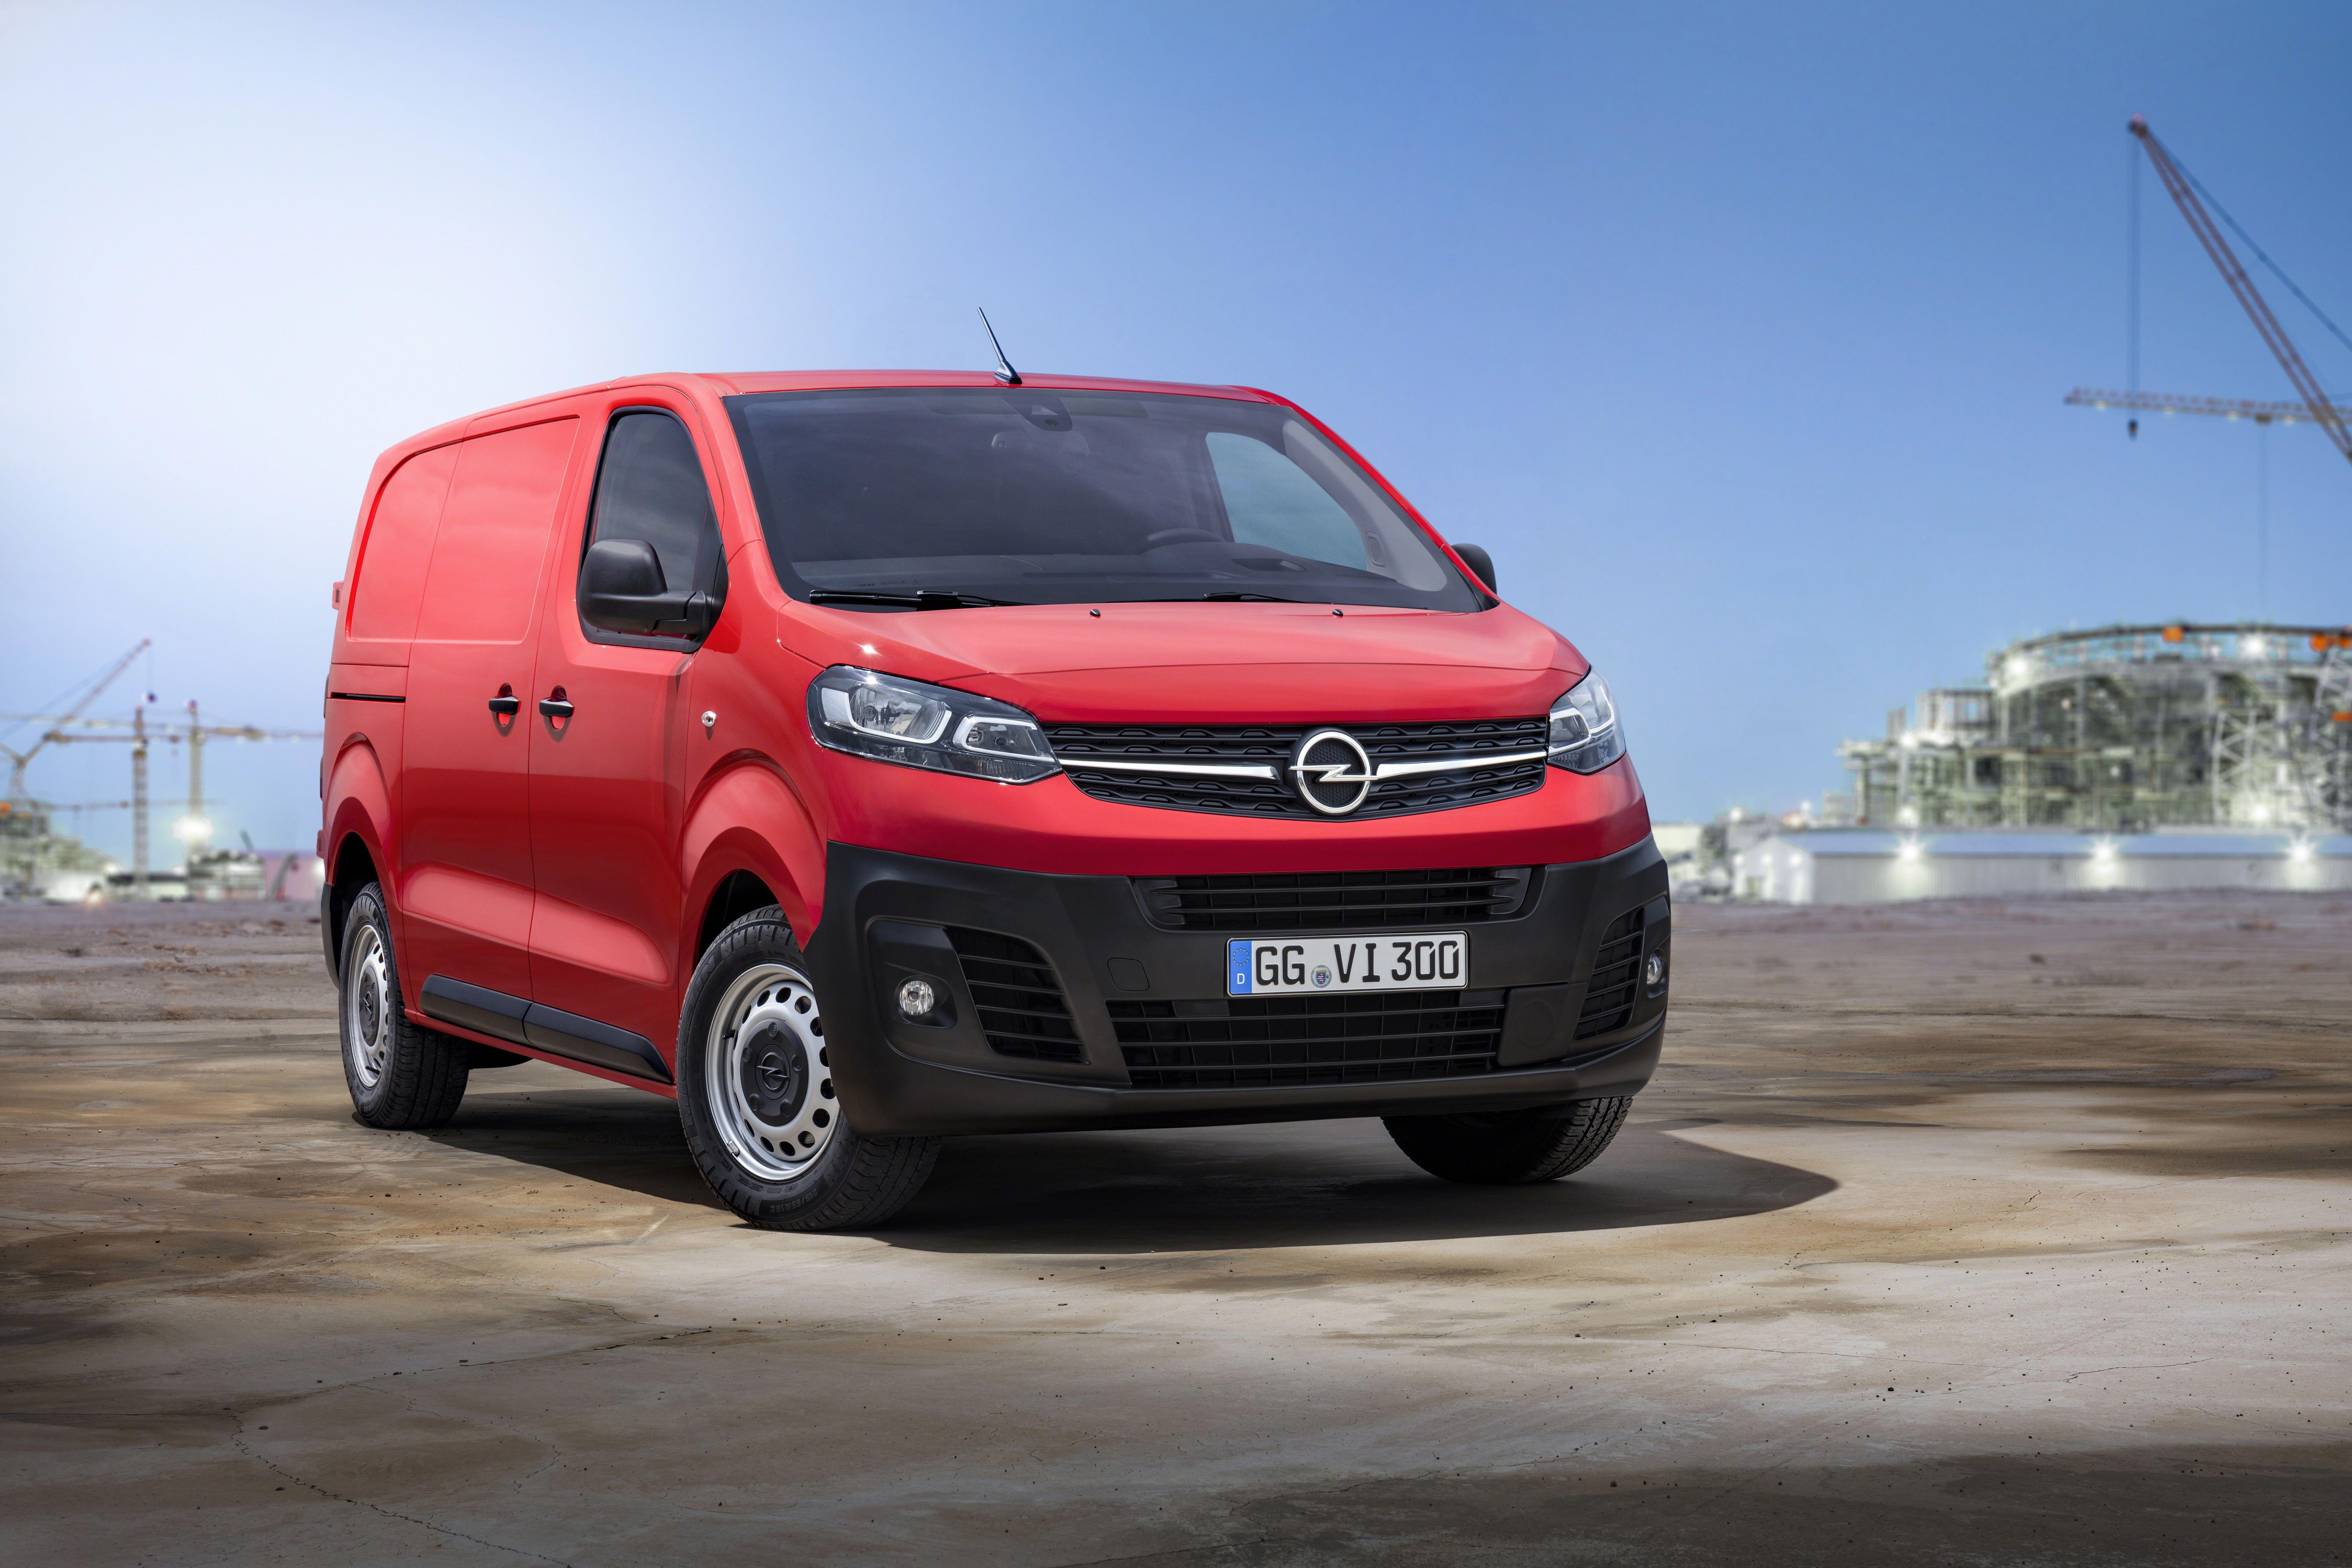 Nowy Opel Zafira 2020 Spesification Check More At Http Car Newmodels Net Nowy Opel Zafira 2020 Di 2020